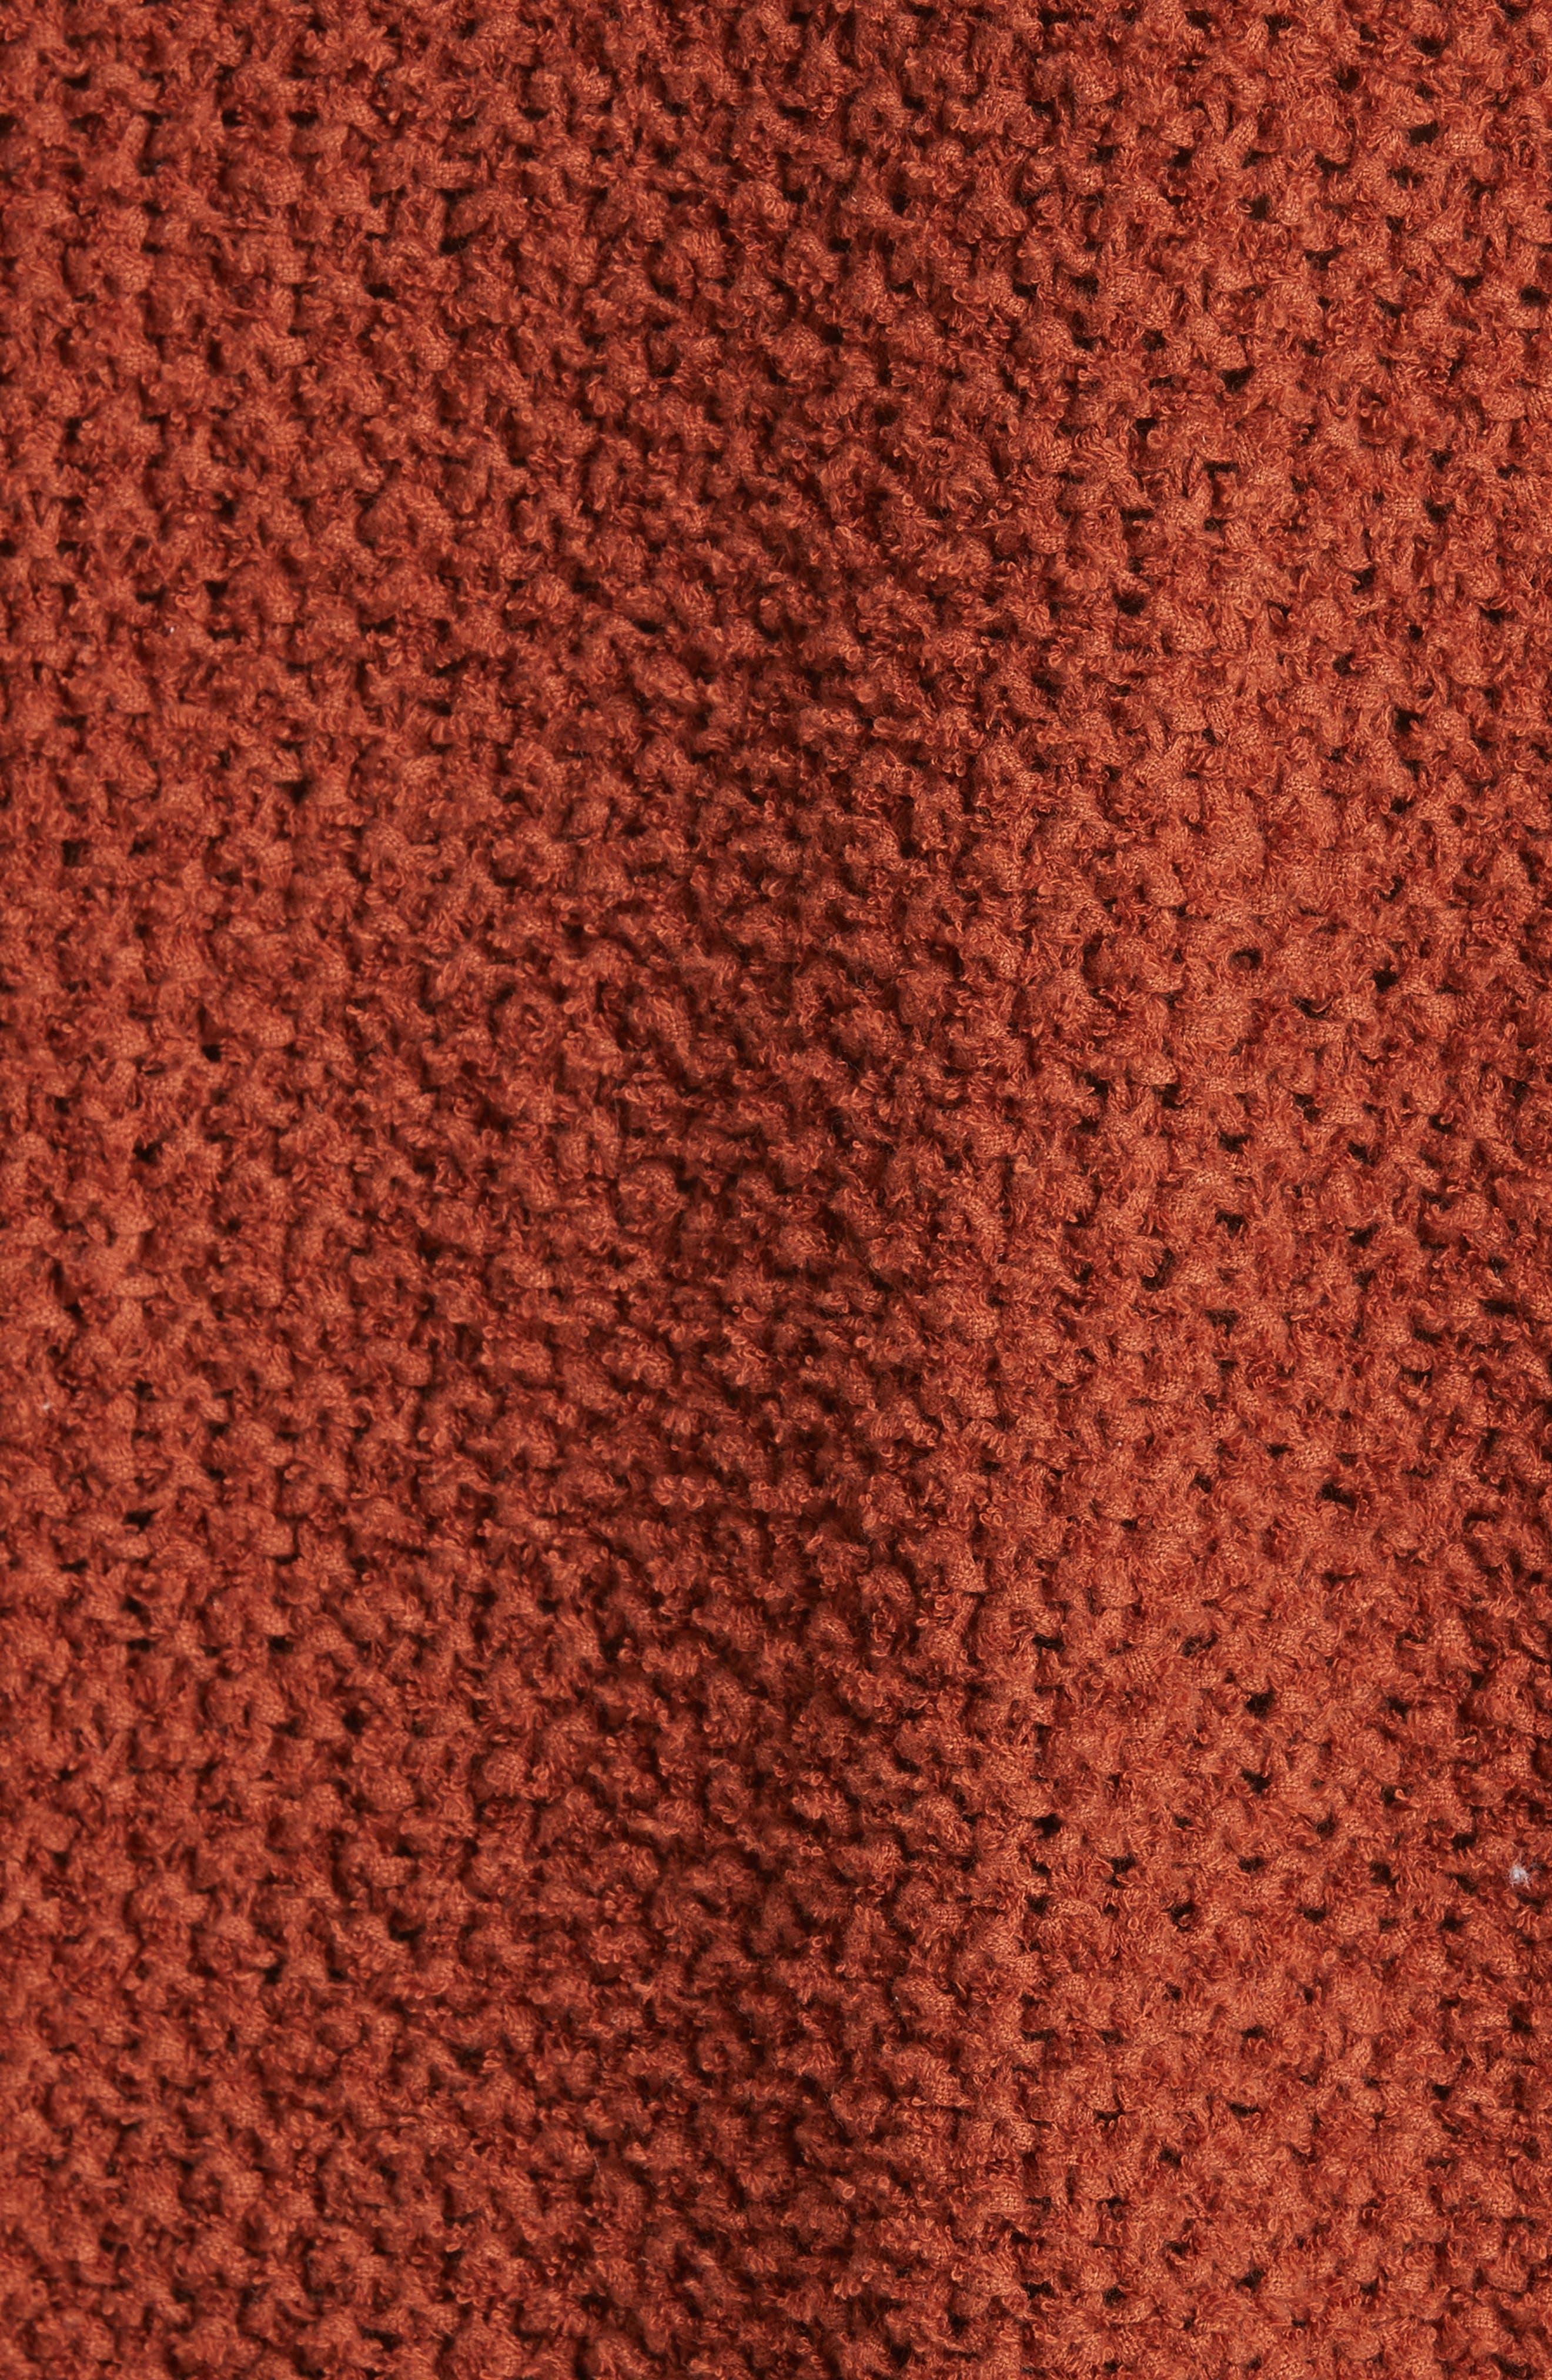 Coco V-Neck Sweater,                             Alternate thumbnail 5, color,                             Terracotta